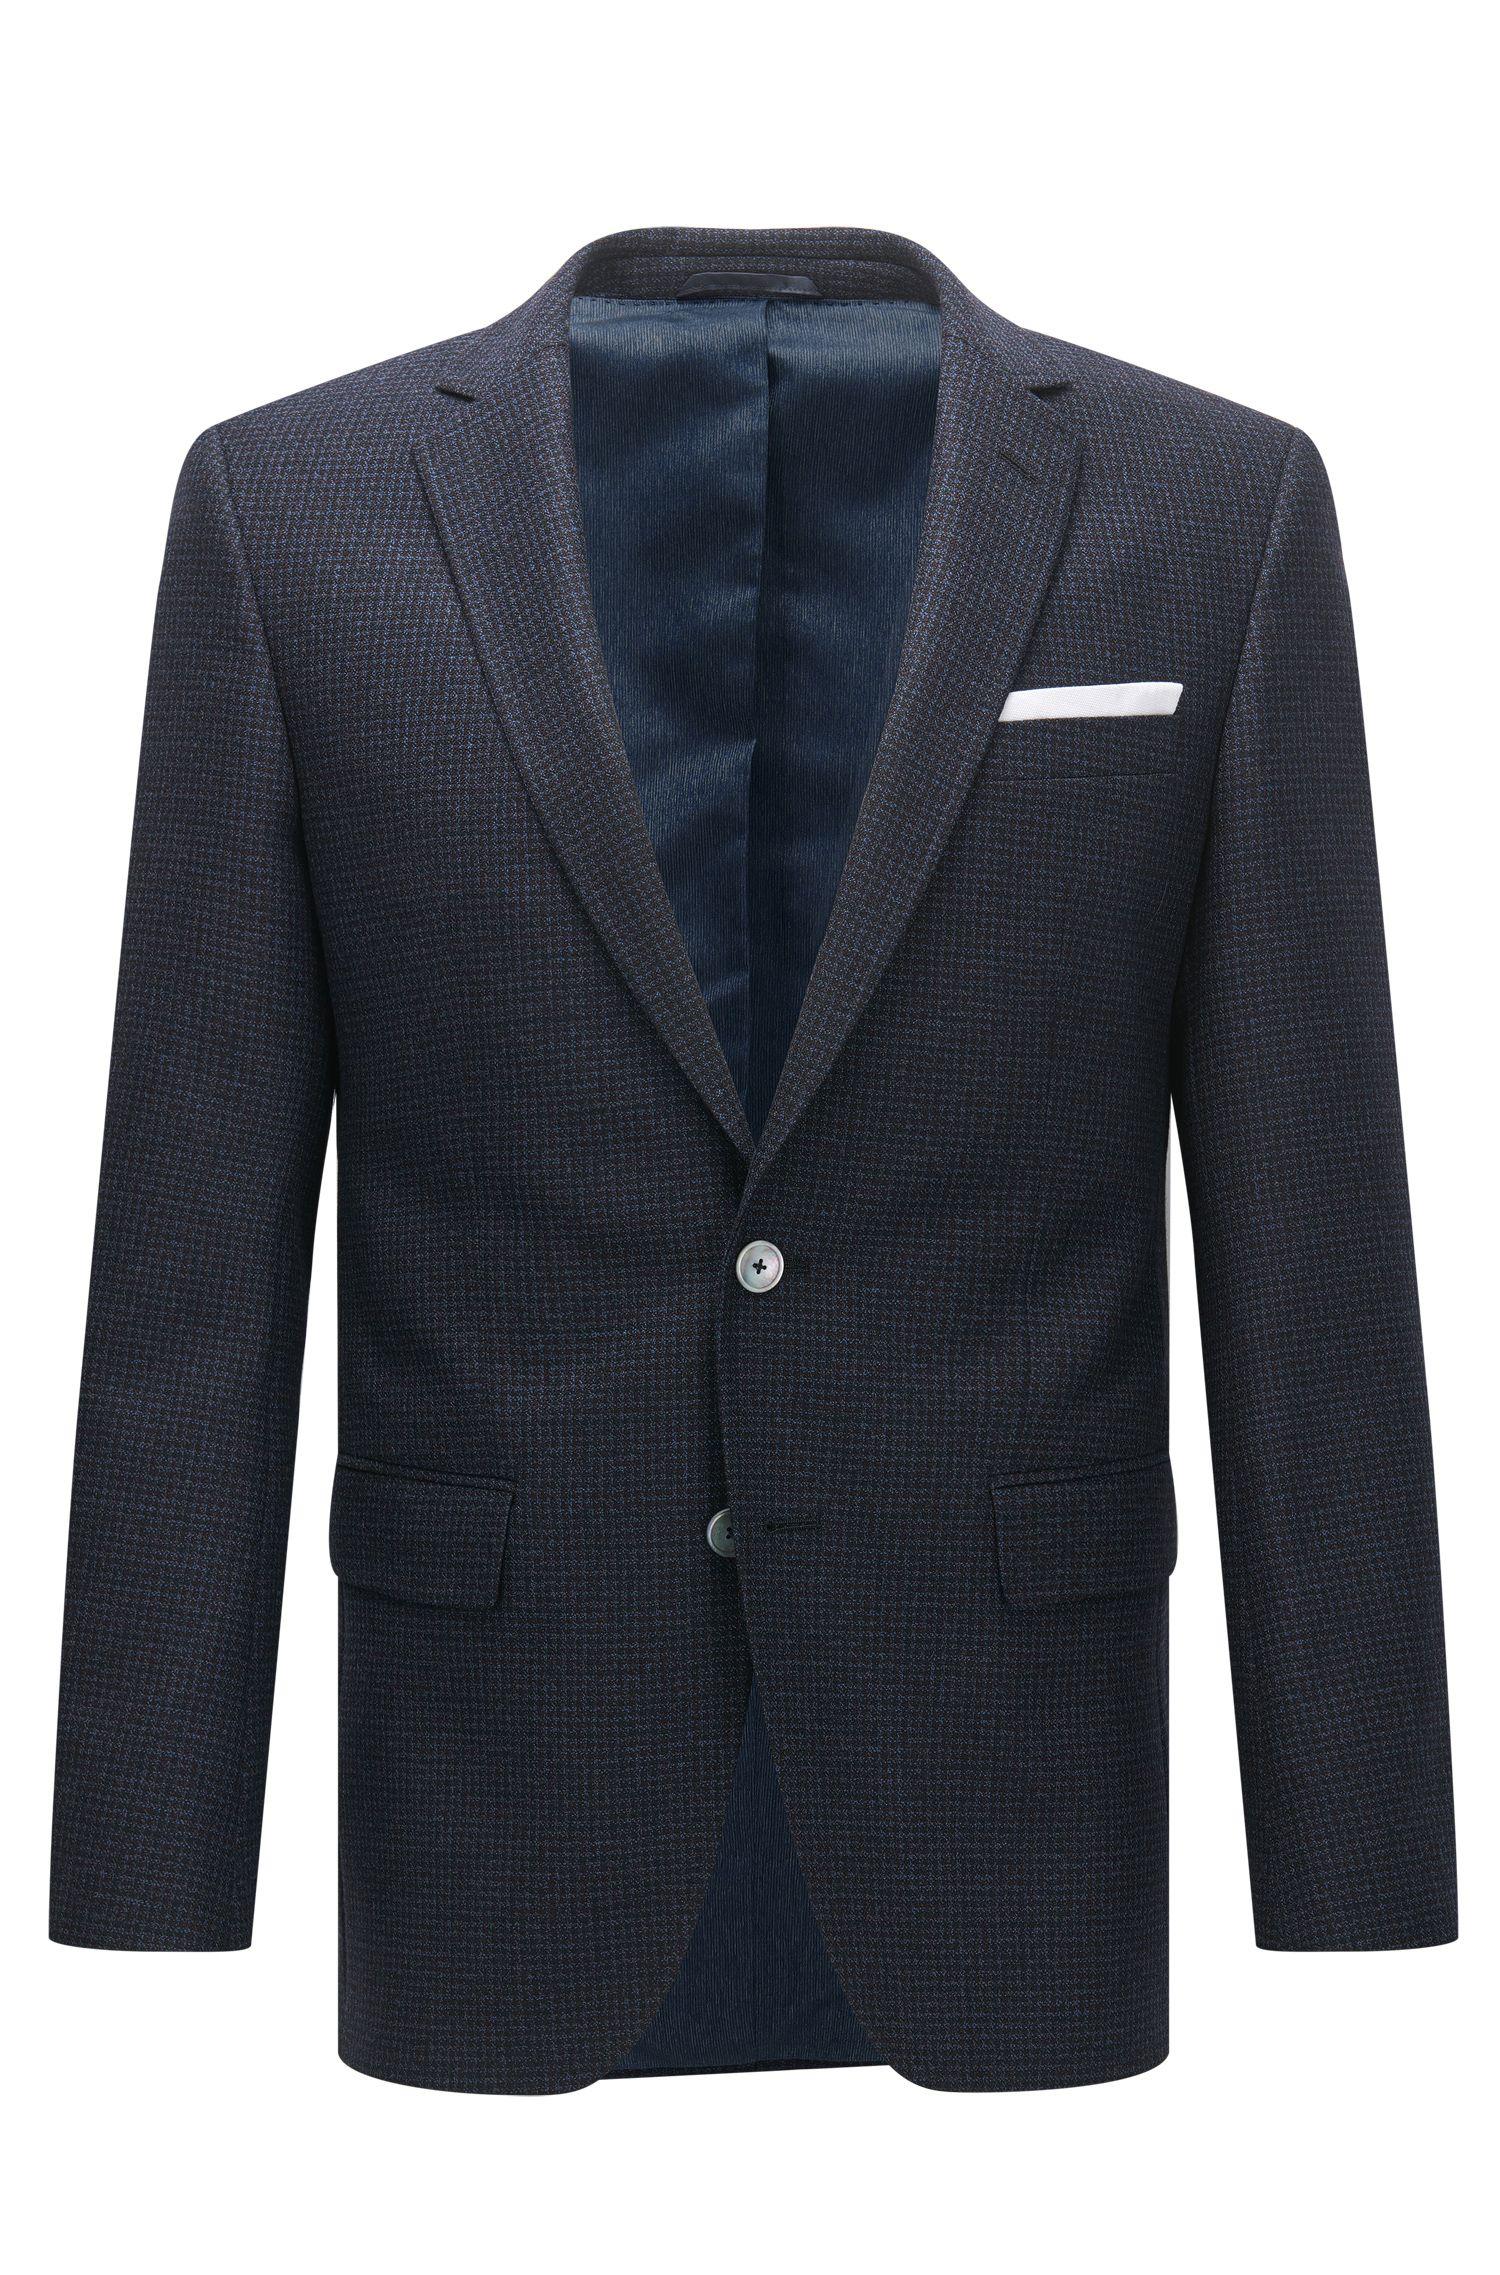 Micro-Check Super 100 Virgin Wool Sport Coat, Slim Fit | Hutsons